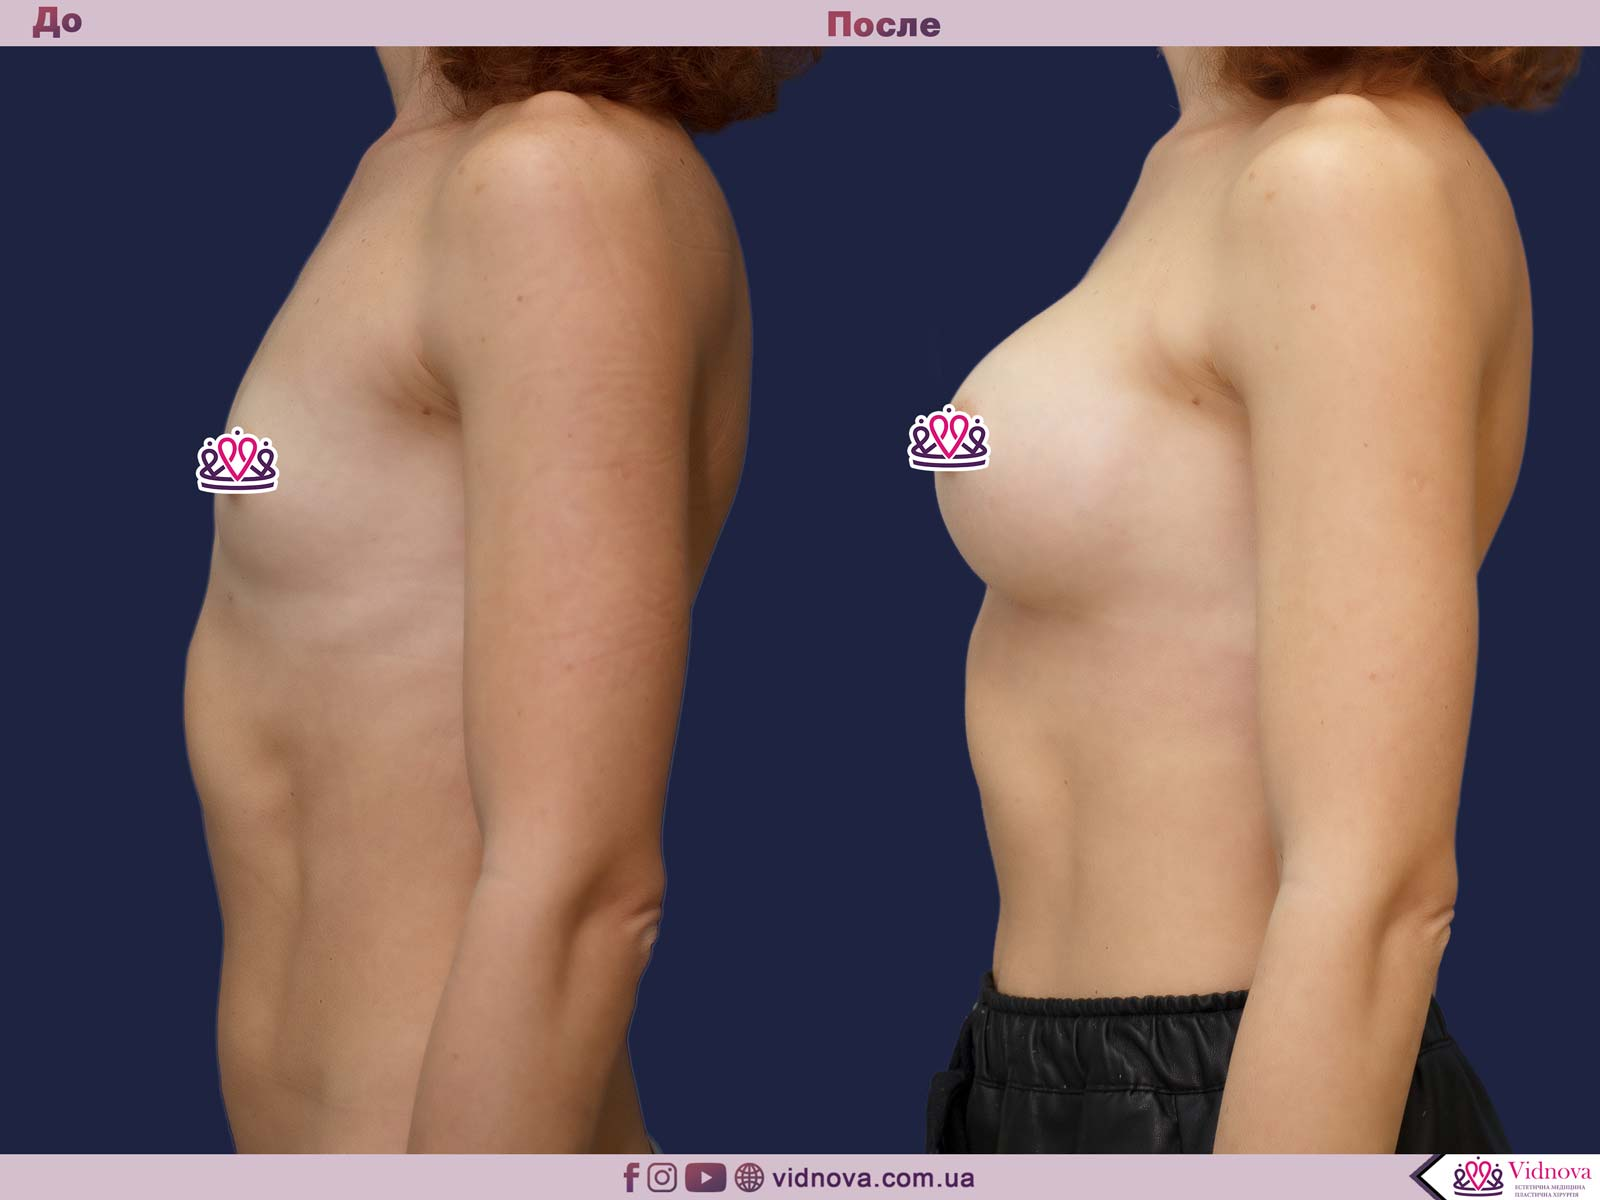 Увеличение груди: Фото ДО и ПОСЛЕ - Пример №64-3 - Клиника Vidnova